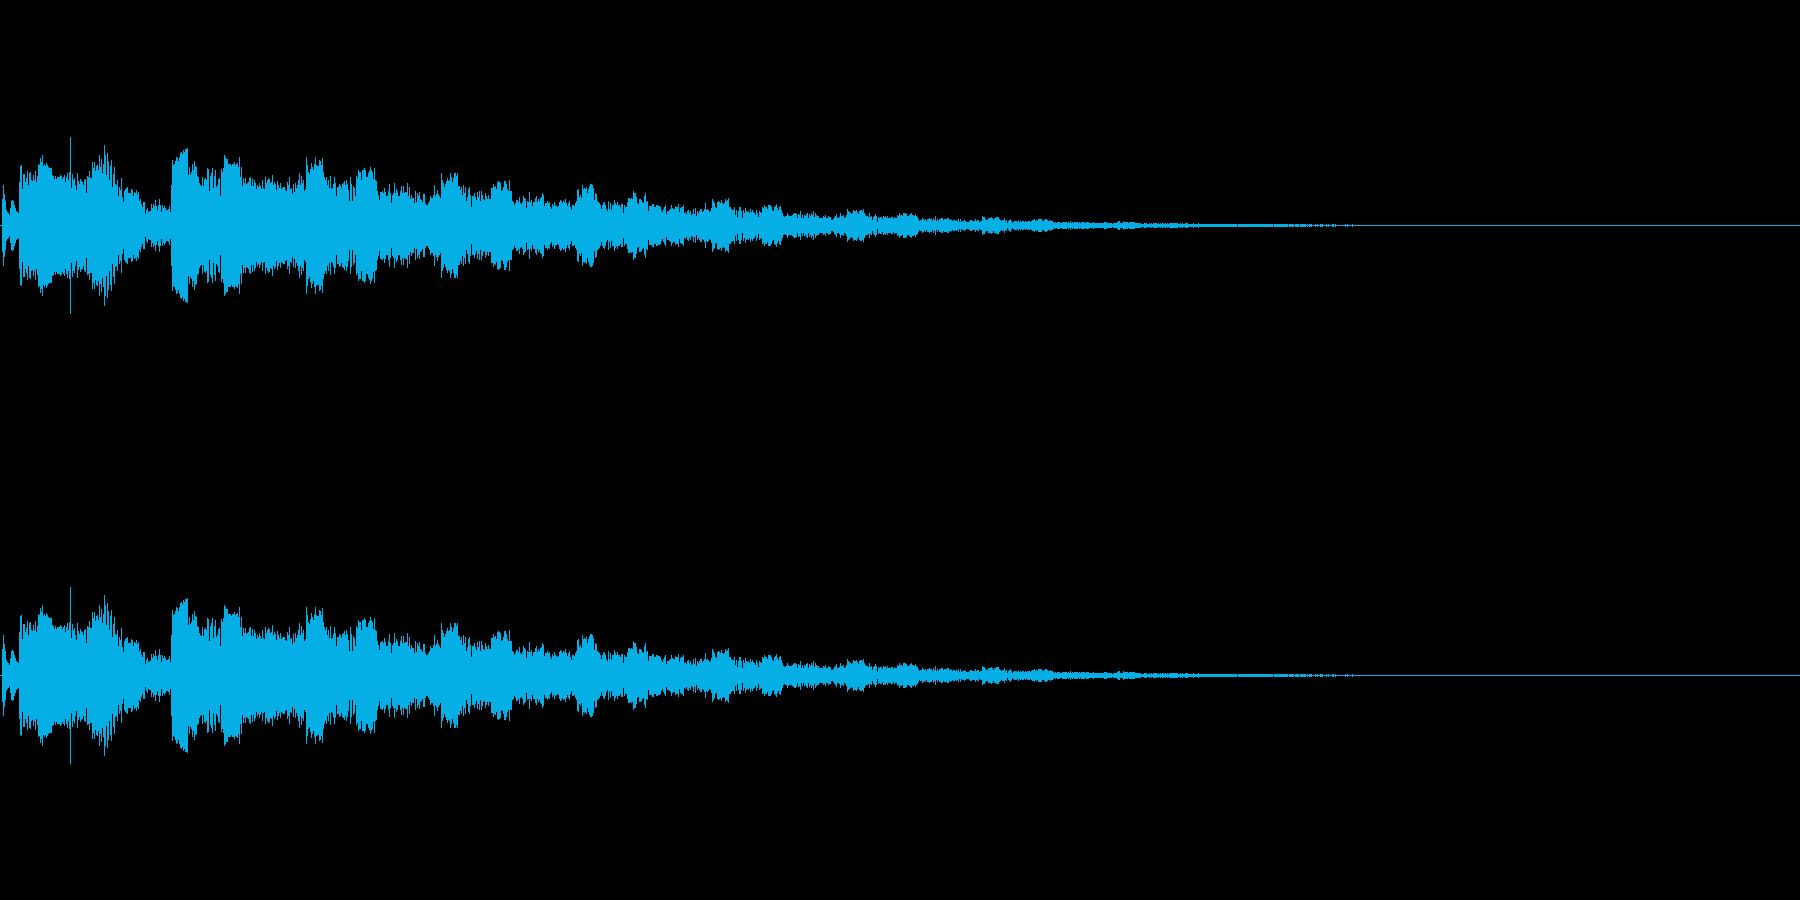 【SE 効果音】PC的な音2の再生済みの波形